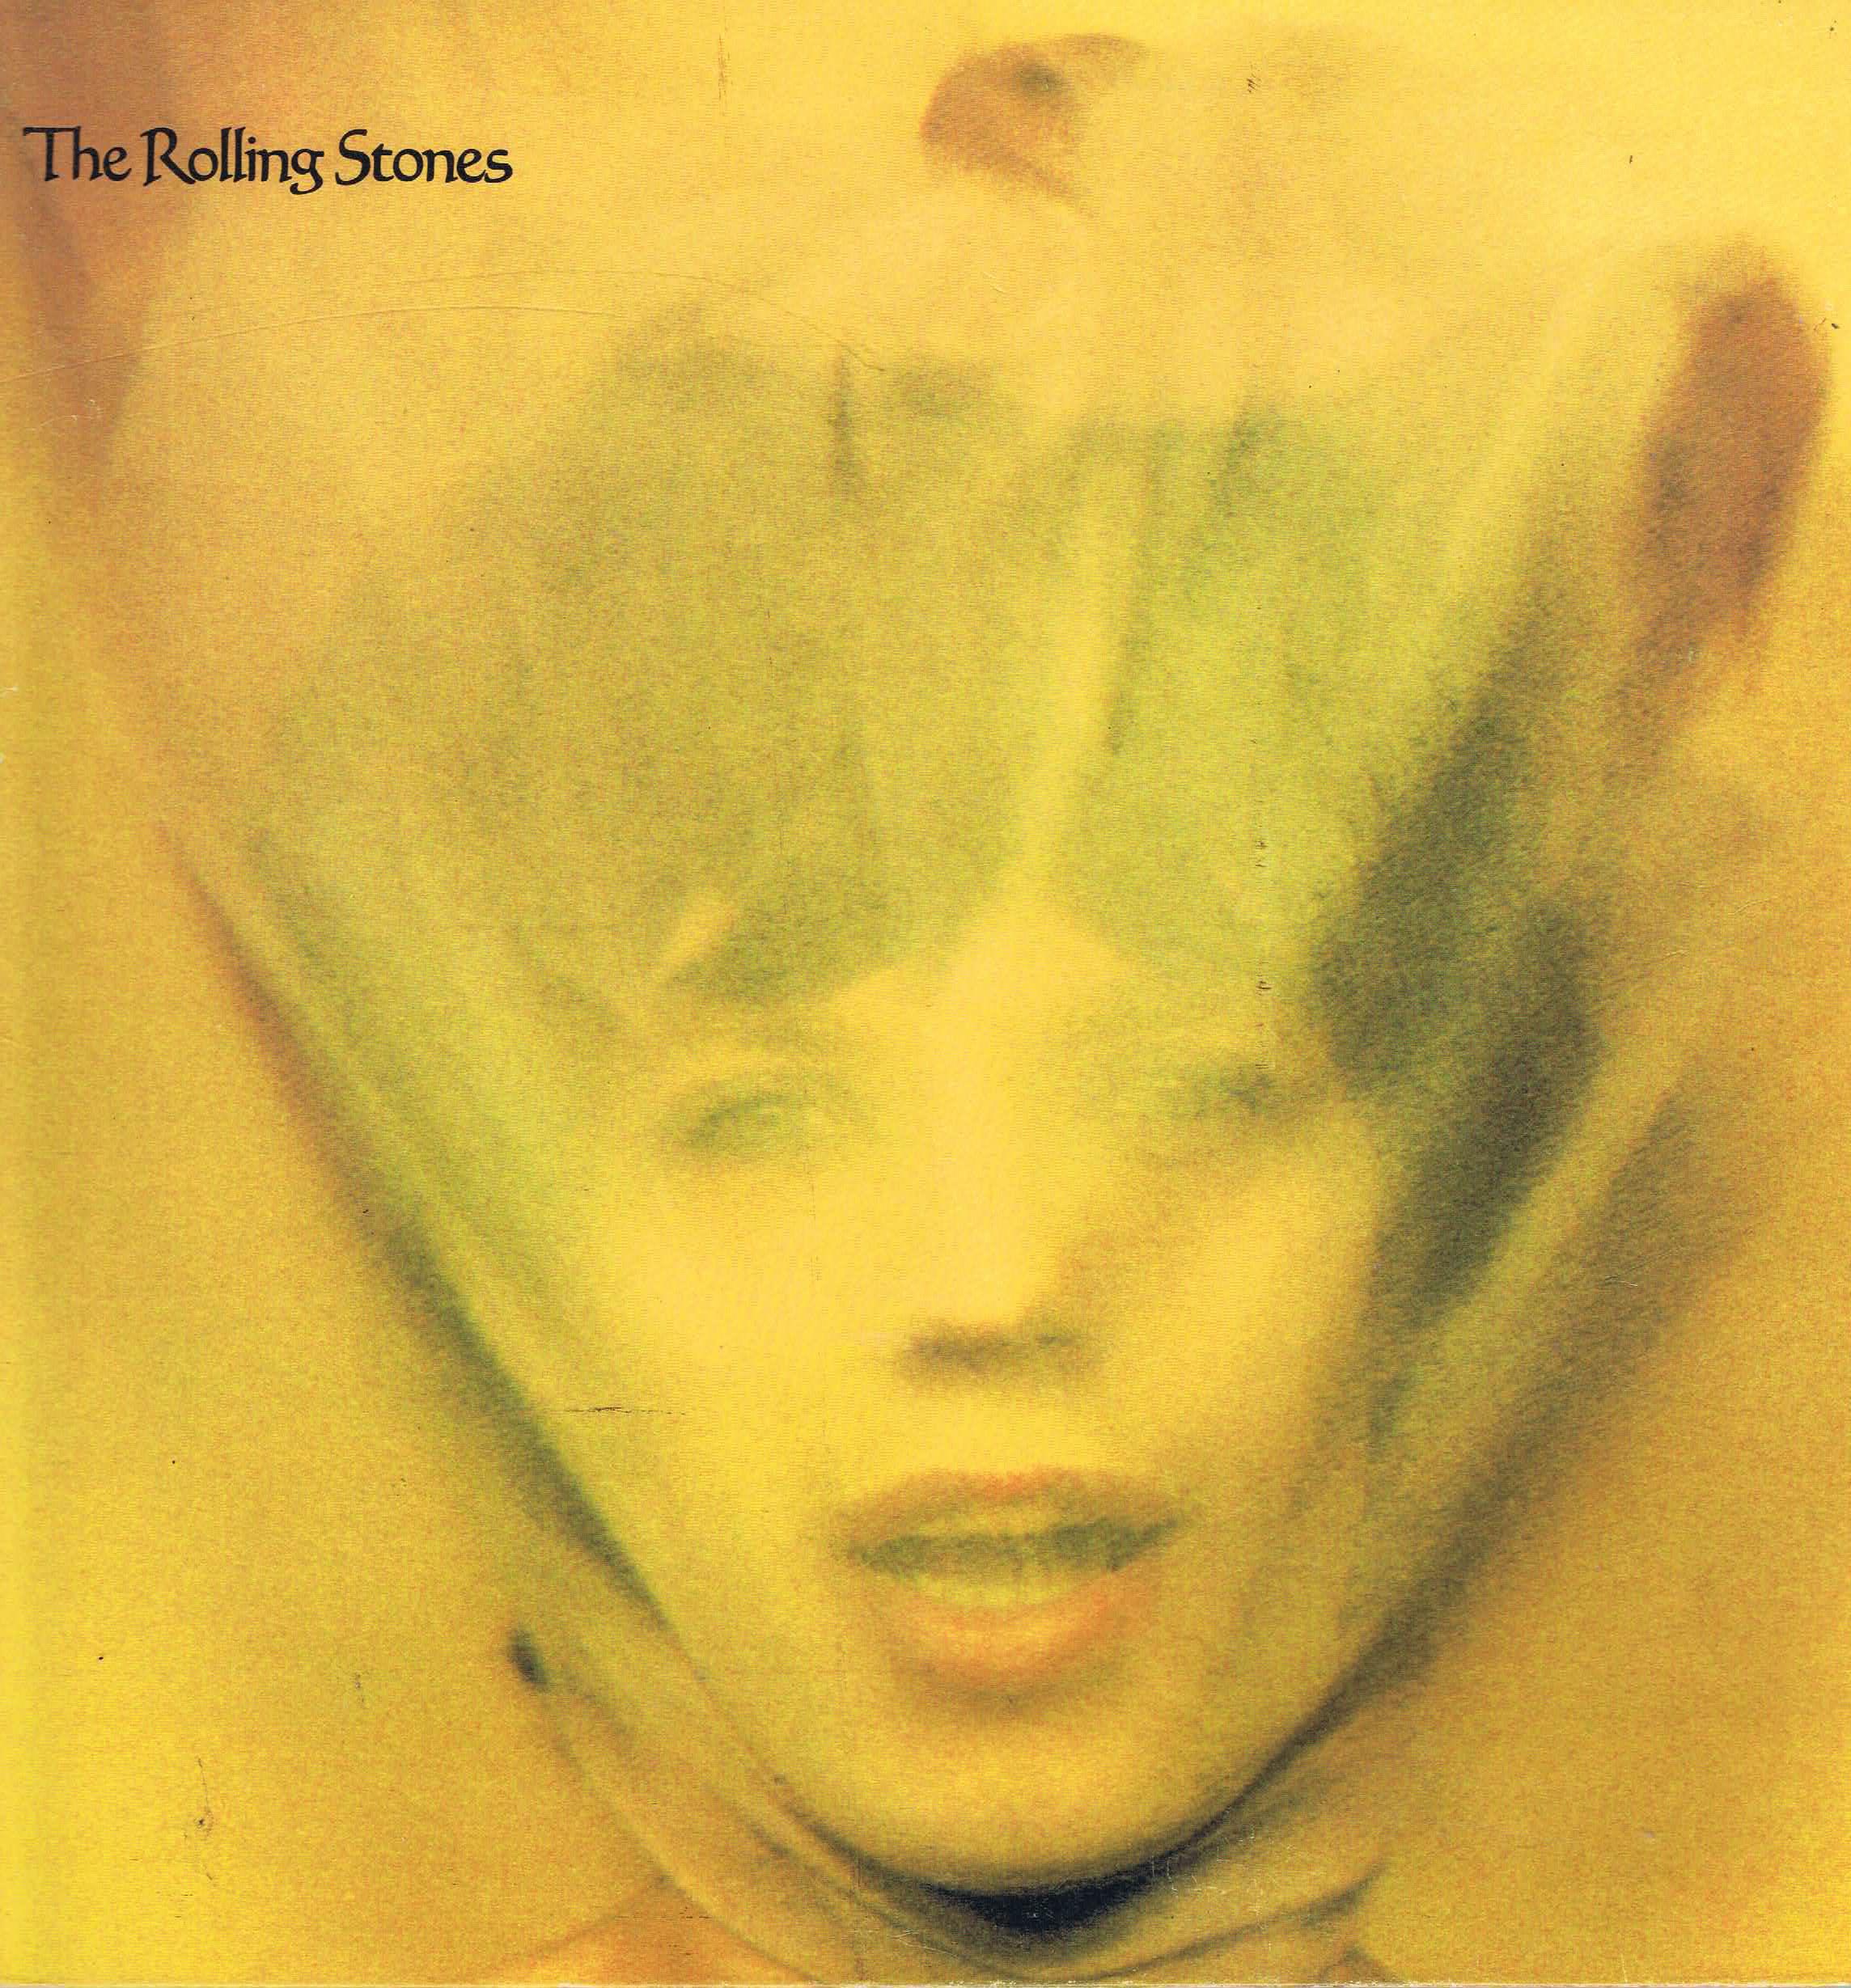 Rolling Stones Goats Head Soup Coc 59101 A2 B1